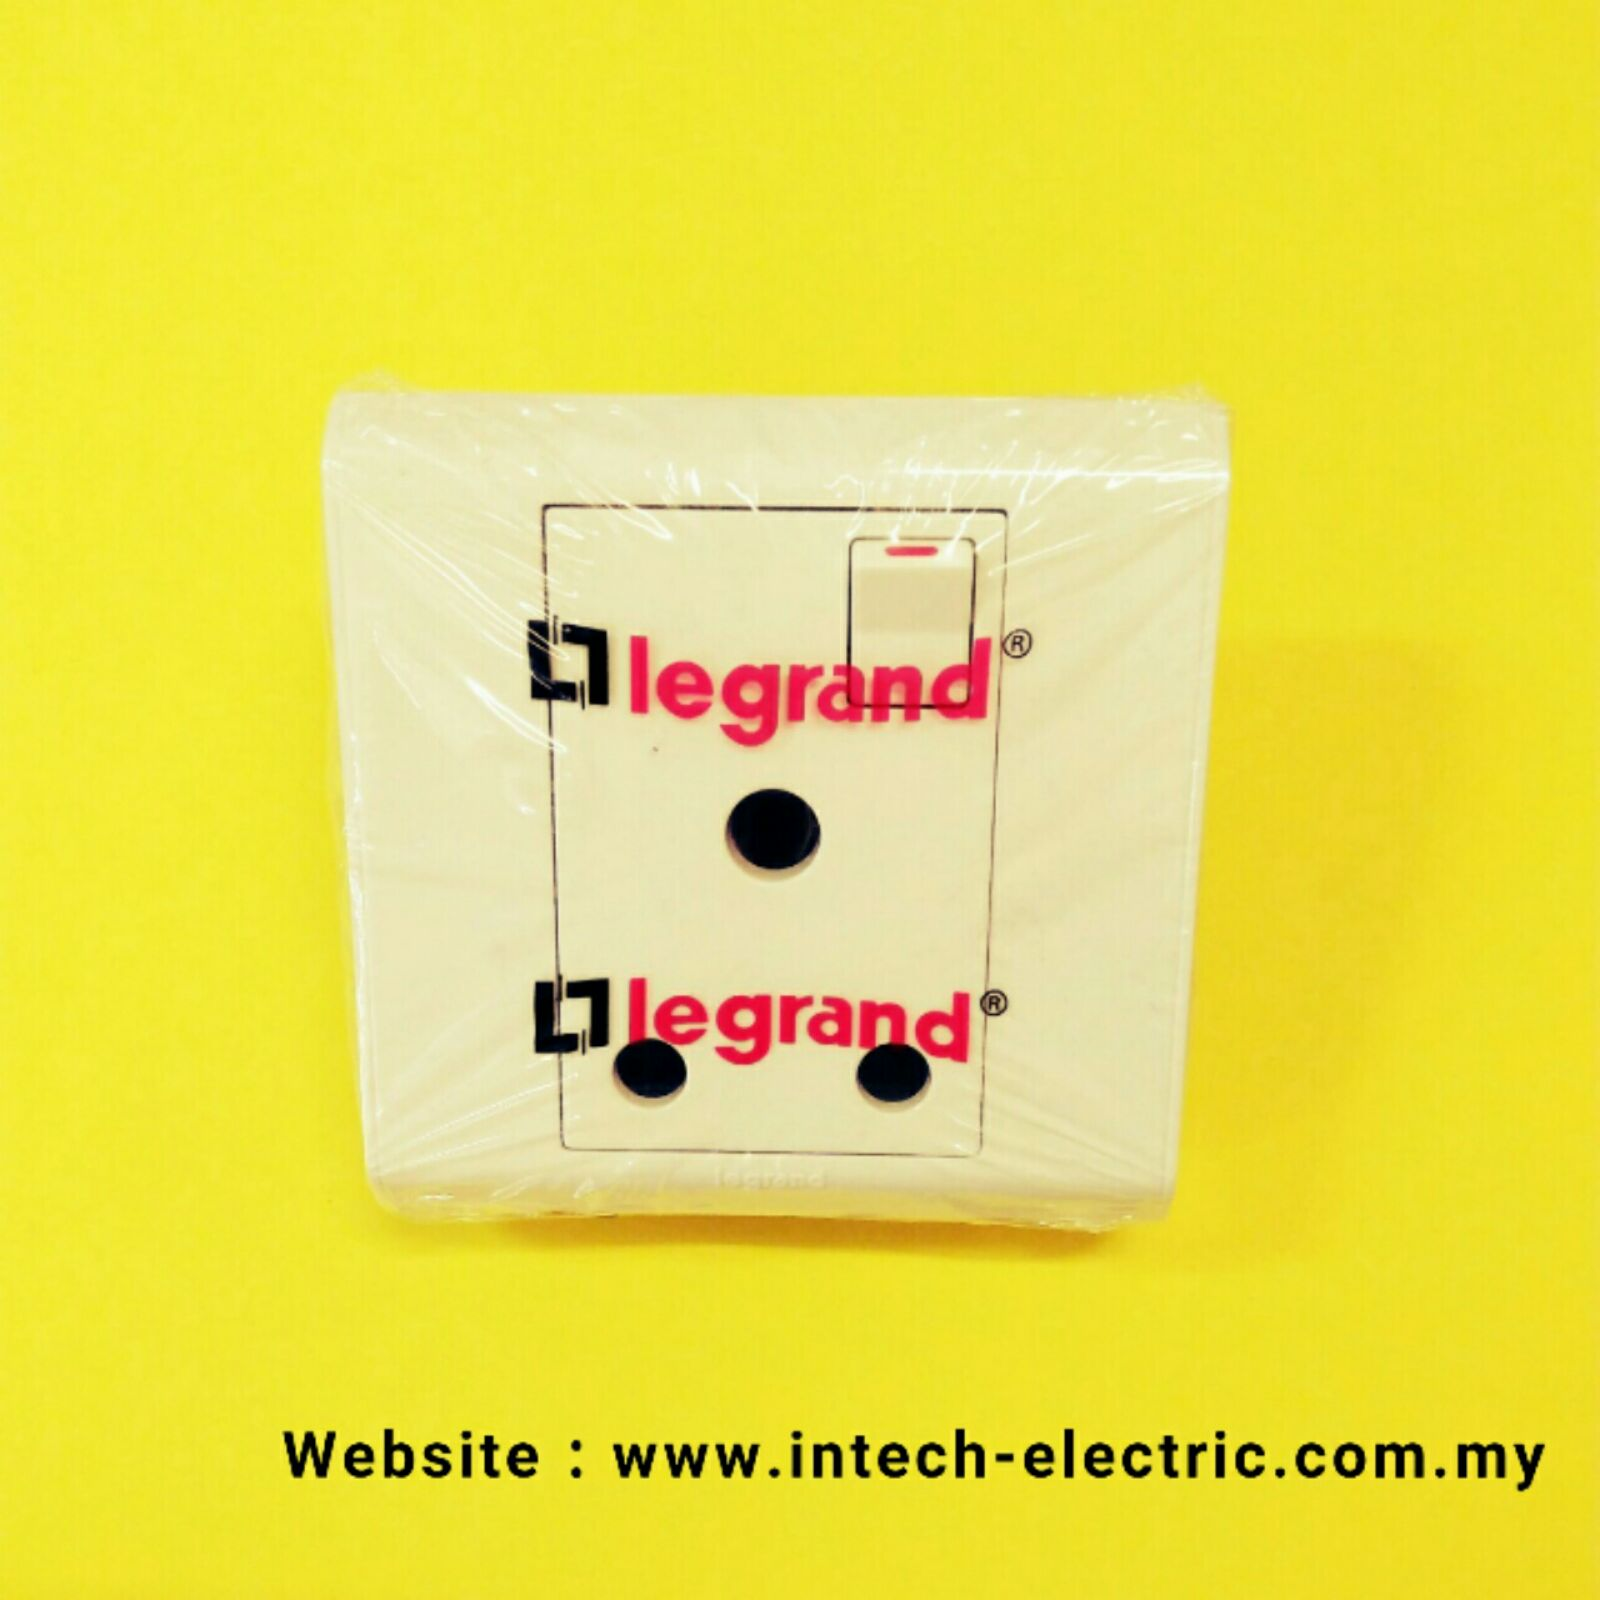 Buy Legrand Belanko 617005 3 Gang 2 Wayswitch Product Online Way Switch Rm1700